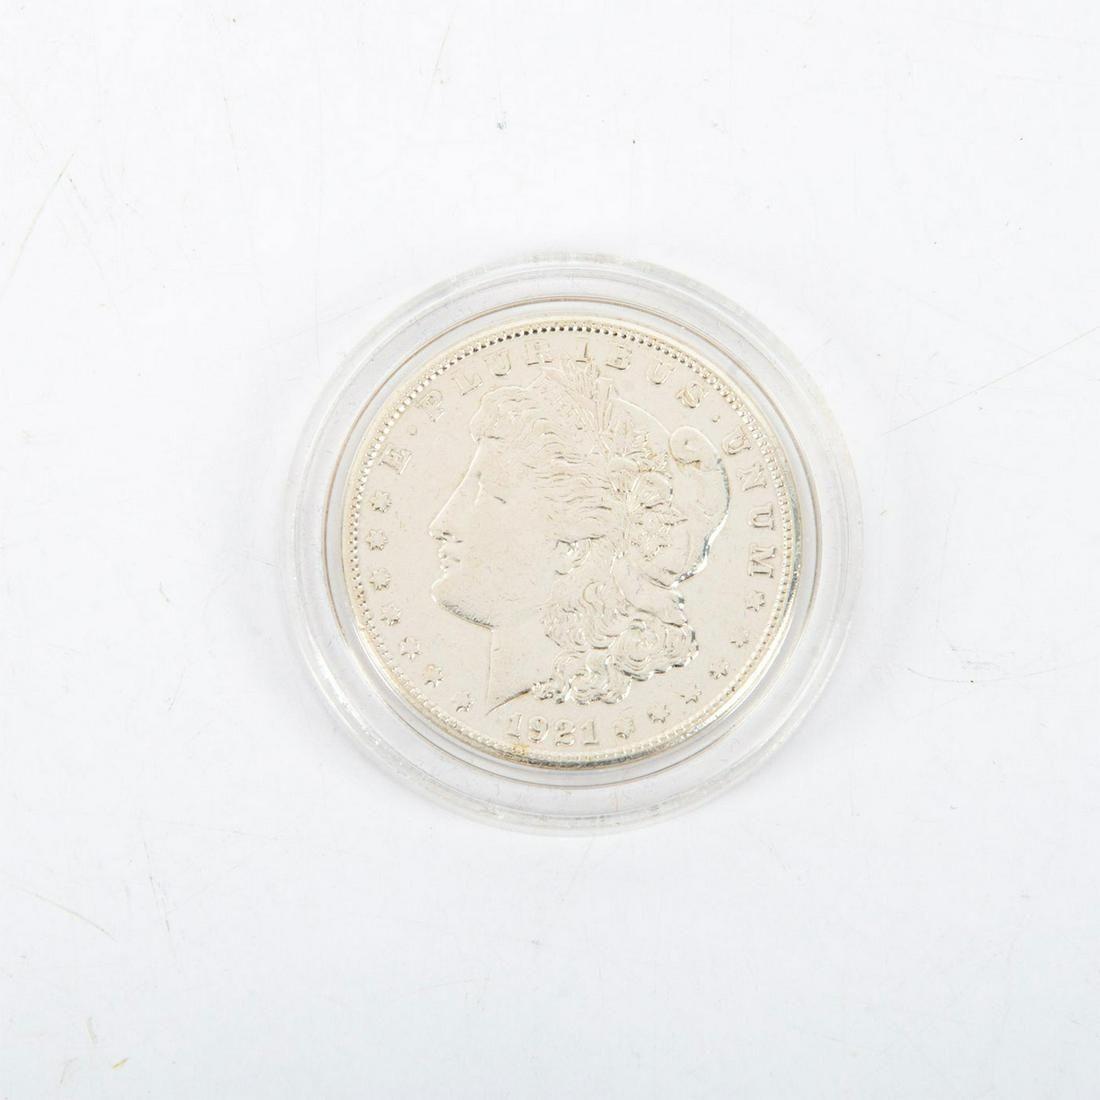 Ms65 Uncirculated 1921 S Morgan Silver Dollar Coin